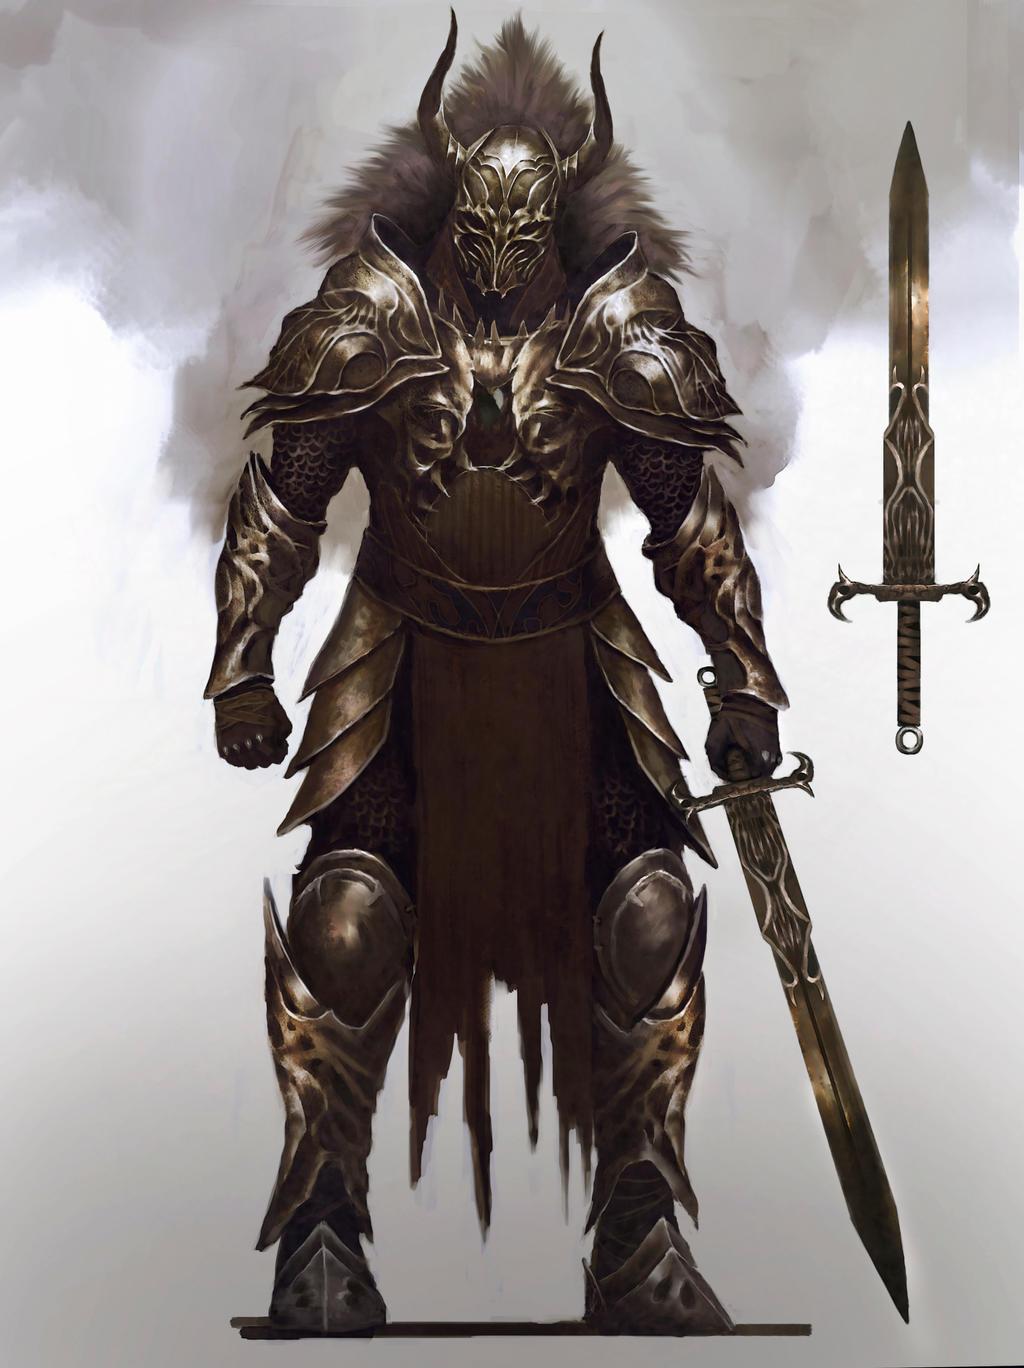 Knight armor design by Nahelus on DeviantArt